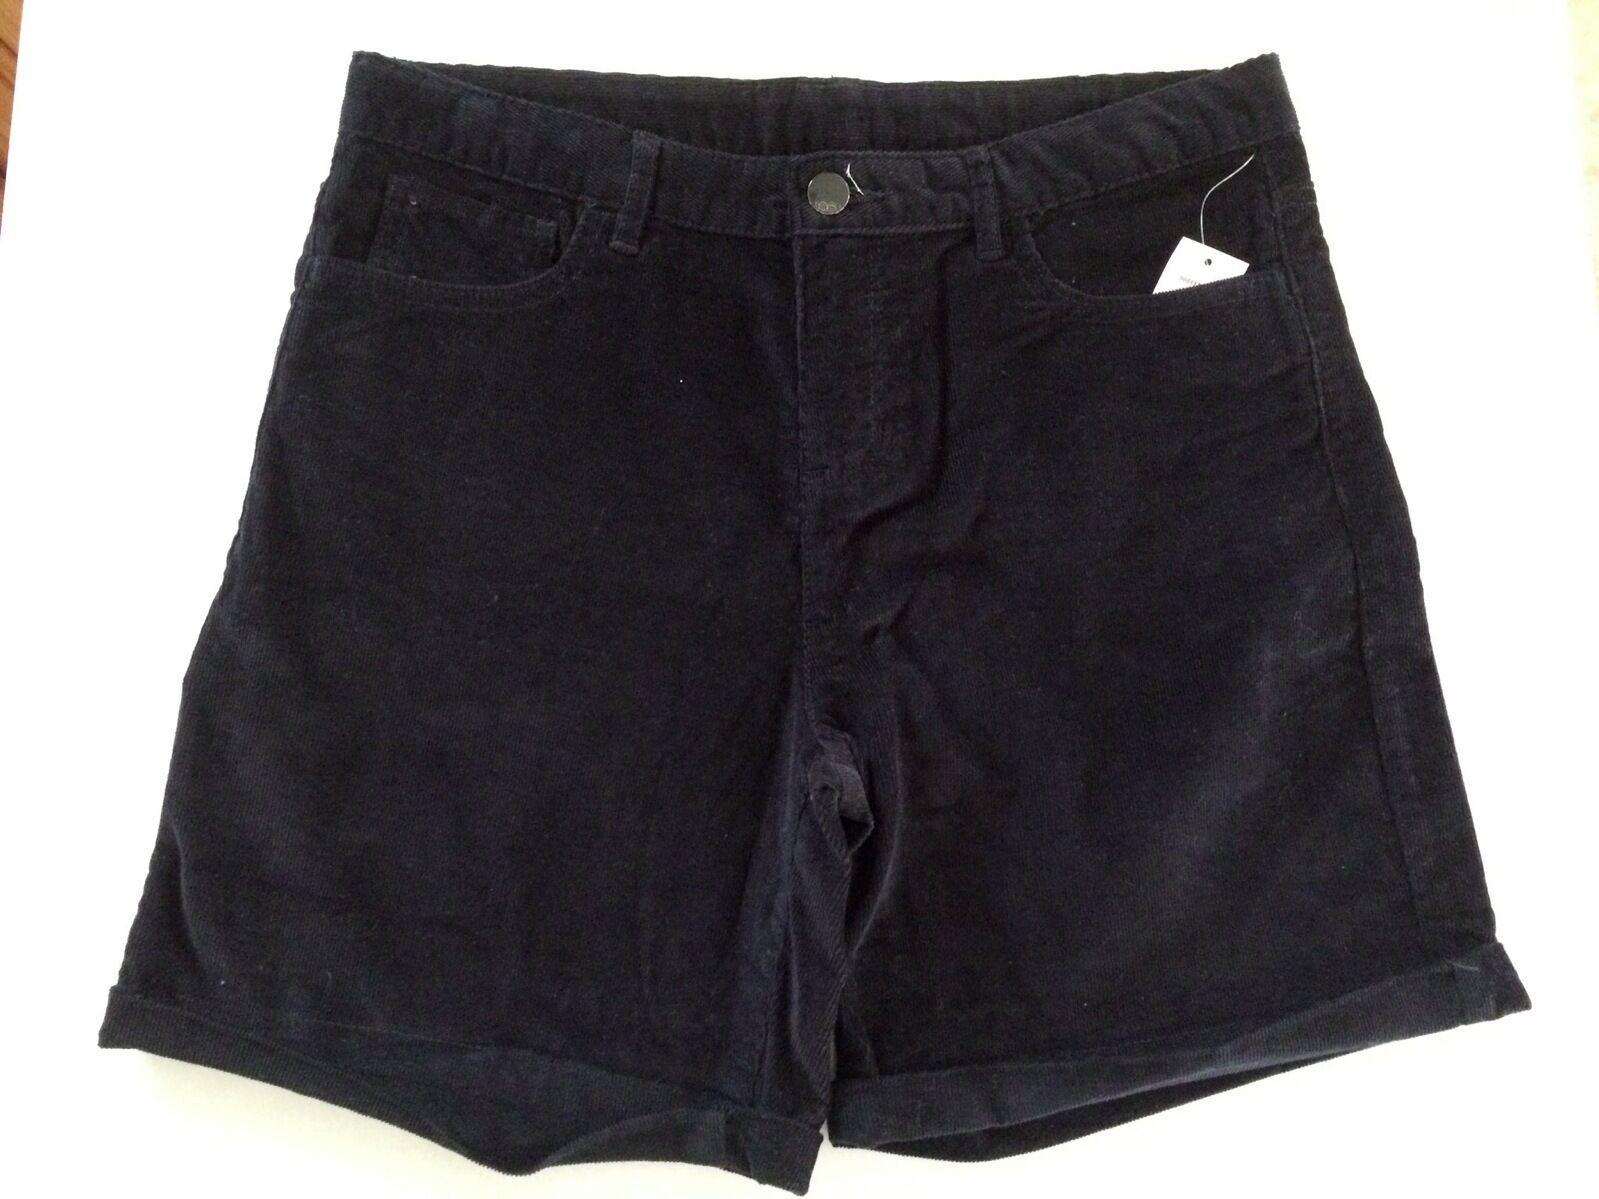 Gap Kids Girls Corduroy Shorts size 18 Plus New - $8.90